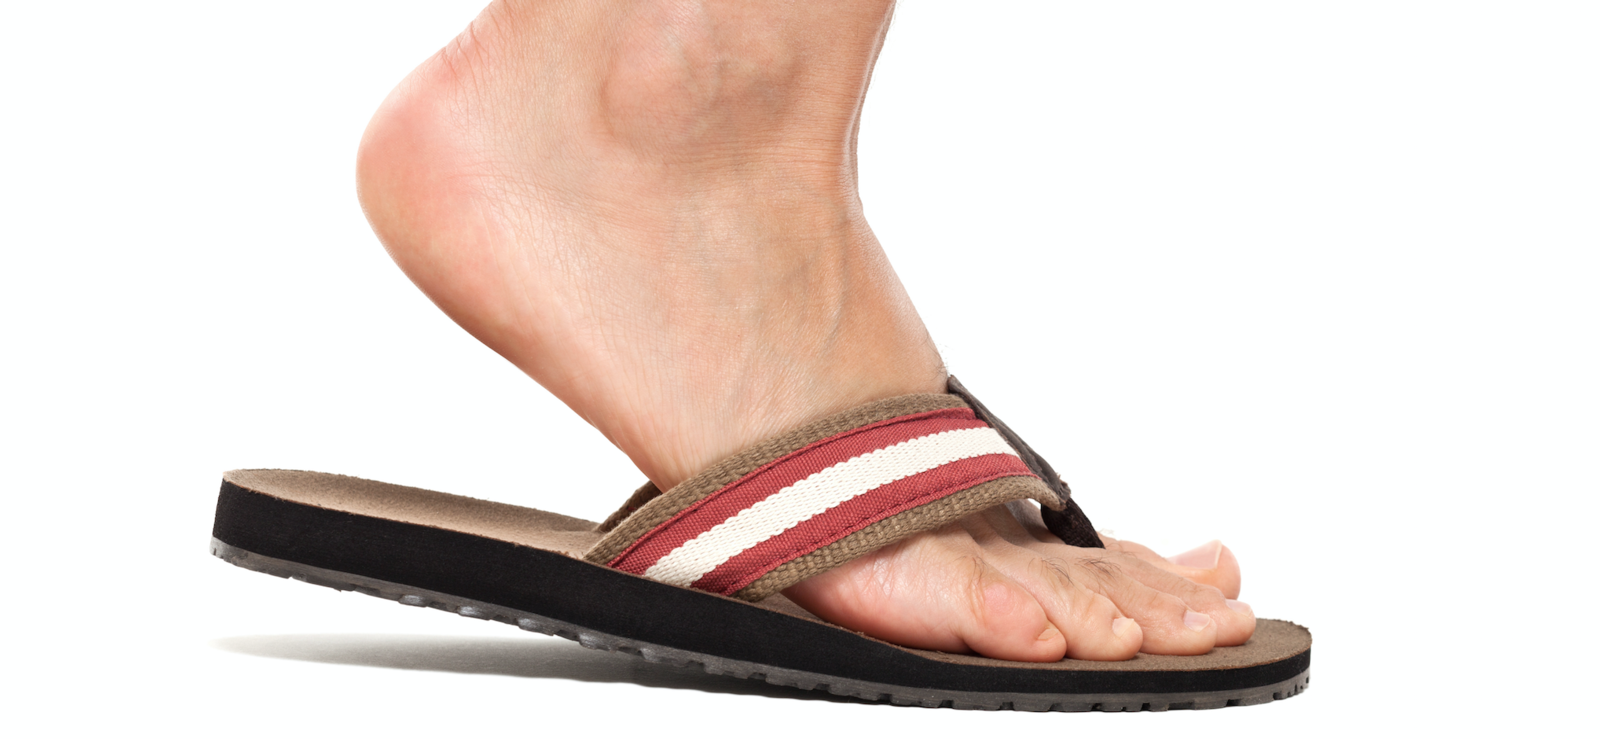 Flat foot in a flat sandal